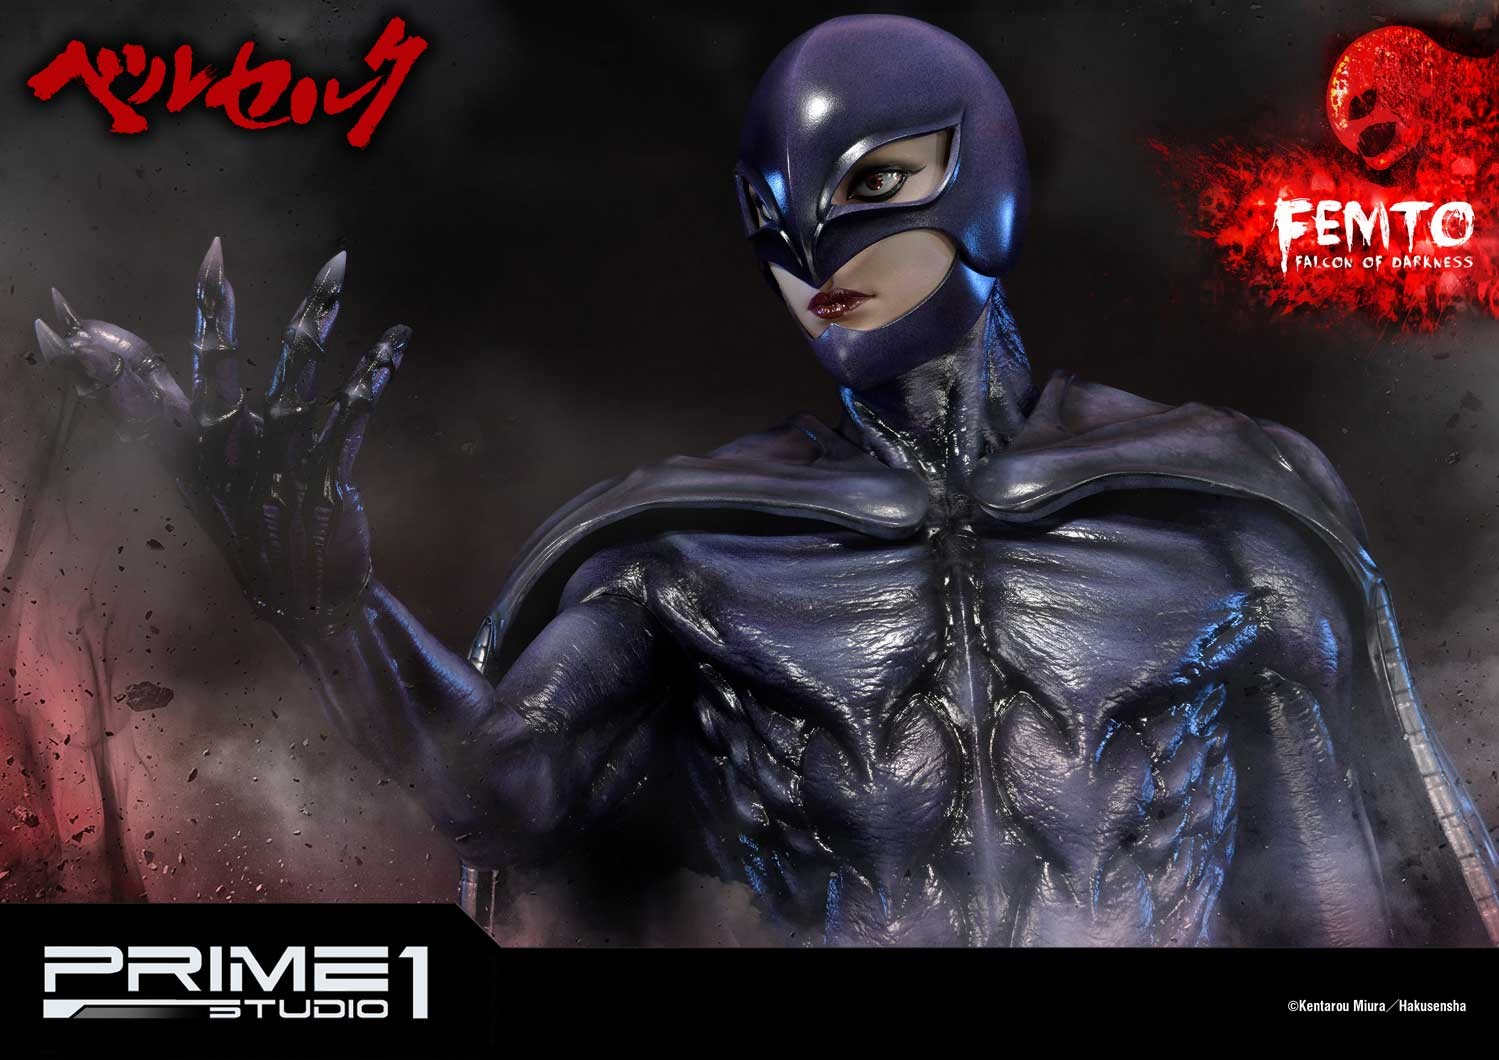 Link a Berserk Femto Falcon of Darkness Ultimate Premium Masterline Prime 1 Studio Itakon.it 28